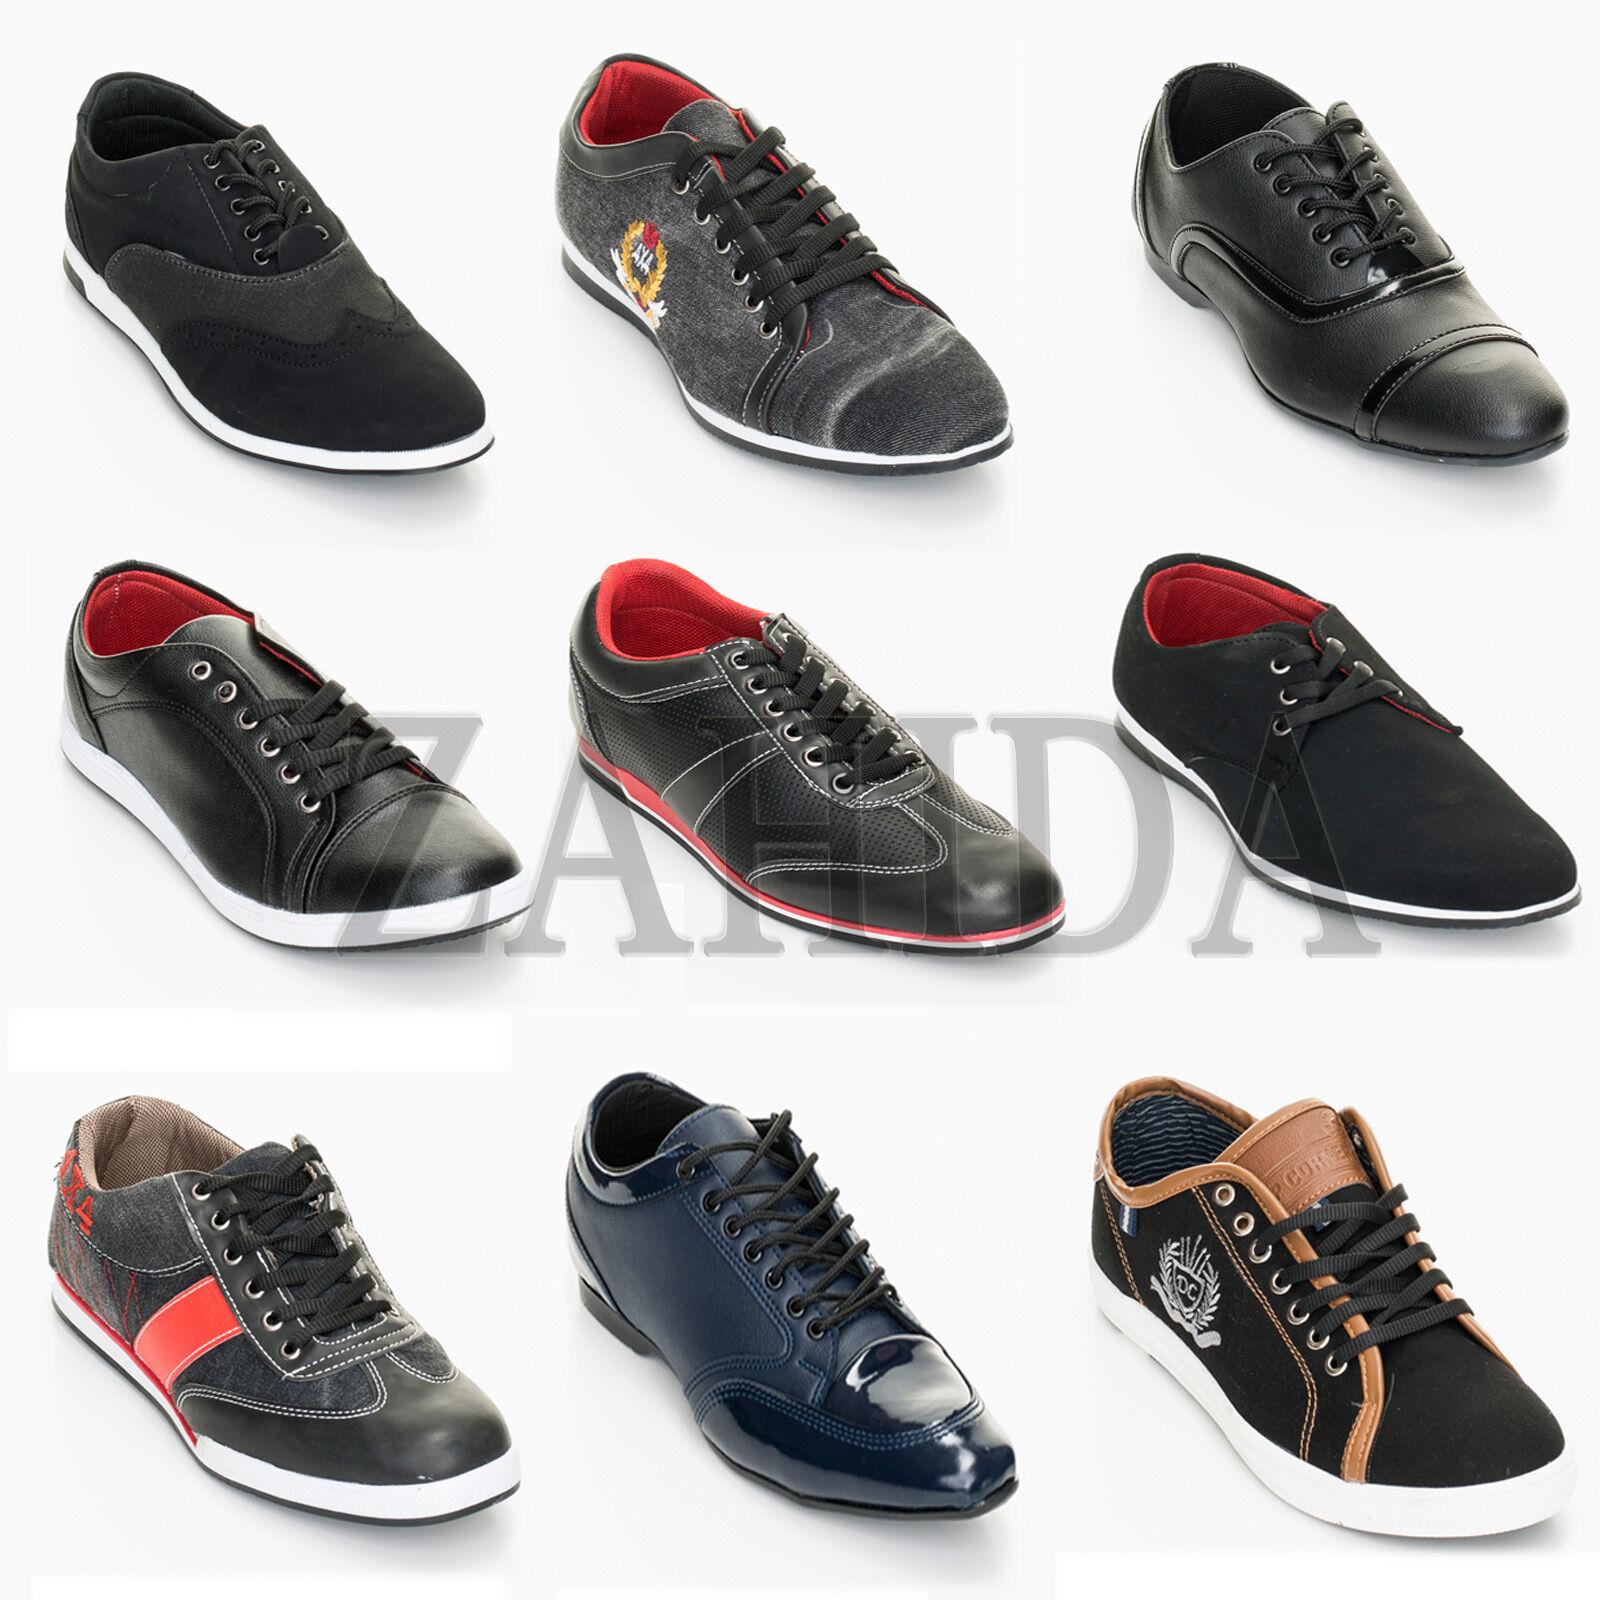 Uomo Scarpe Sneaker Business NERO Salameh turnshuhe CLUB PARTY NERO Business 40-44 NUOVO 8ce262